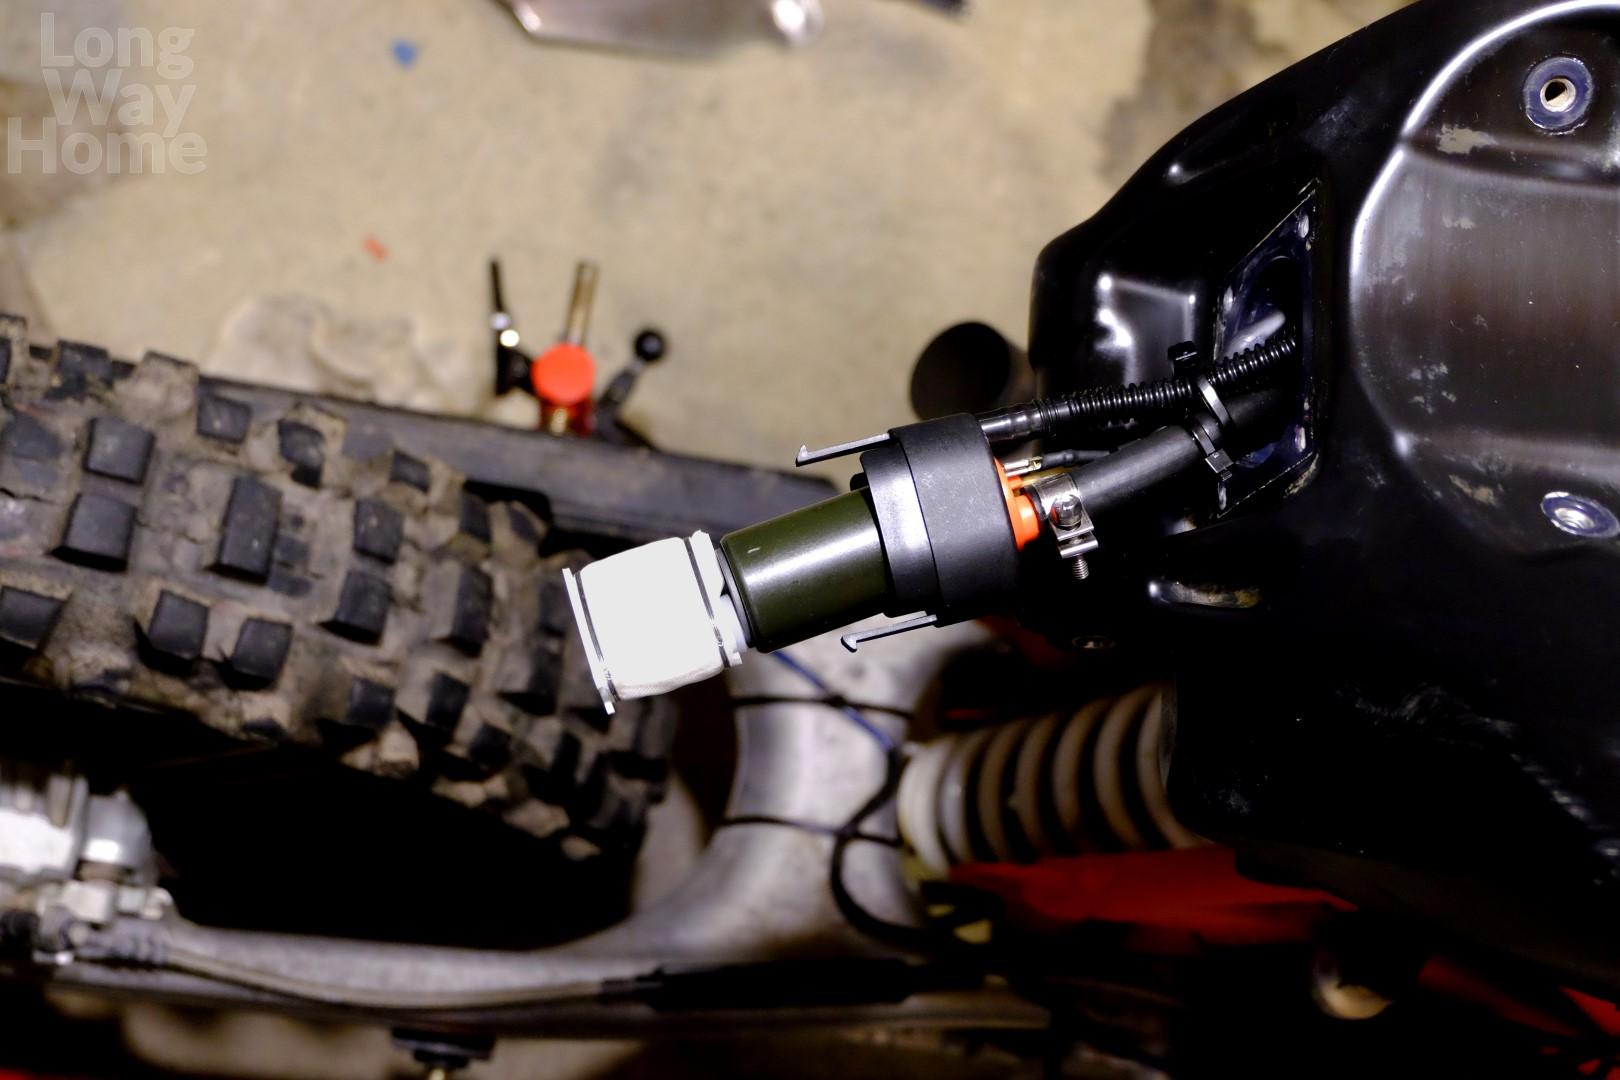 Long Way Home - Workshop - KTM 690 Enduro - Fuel pump update